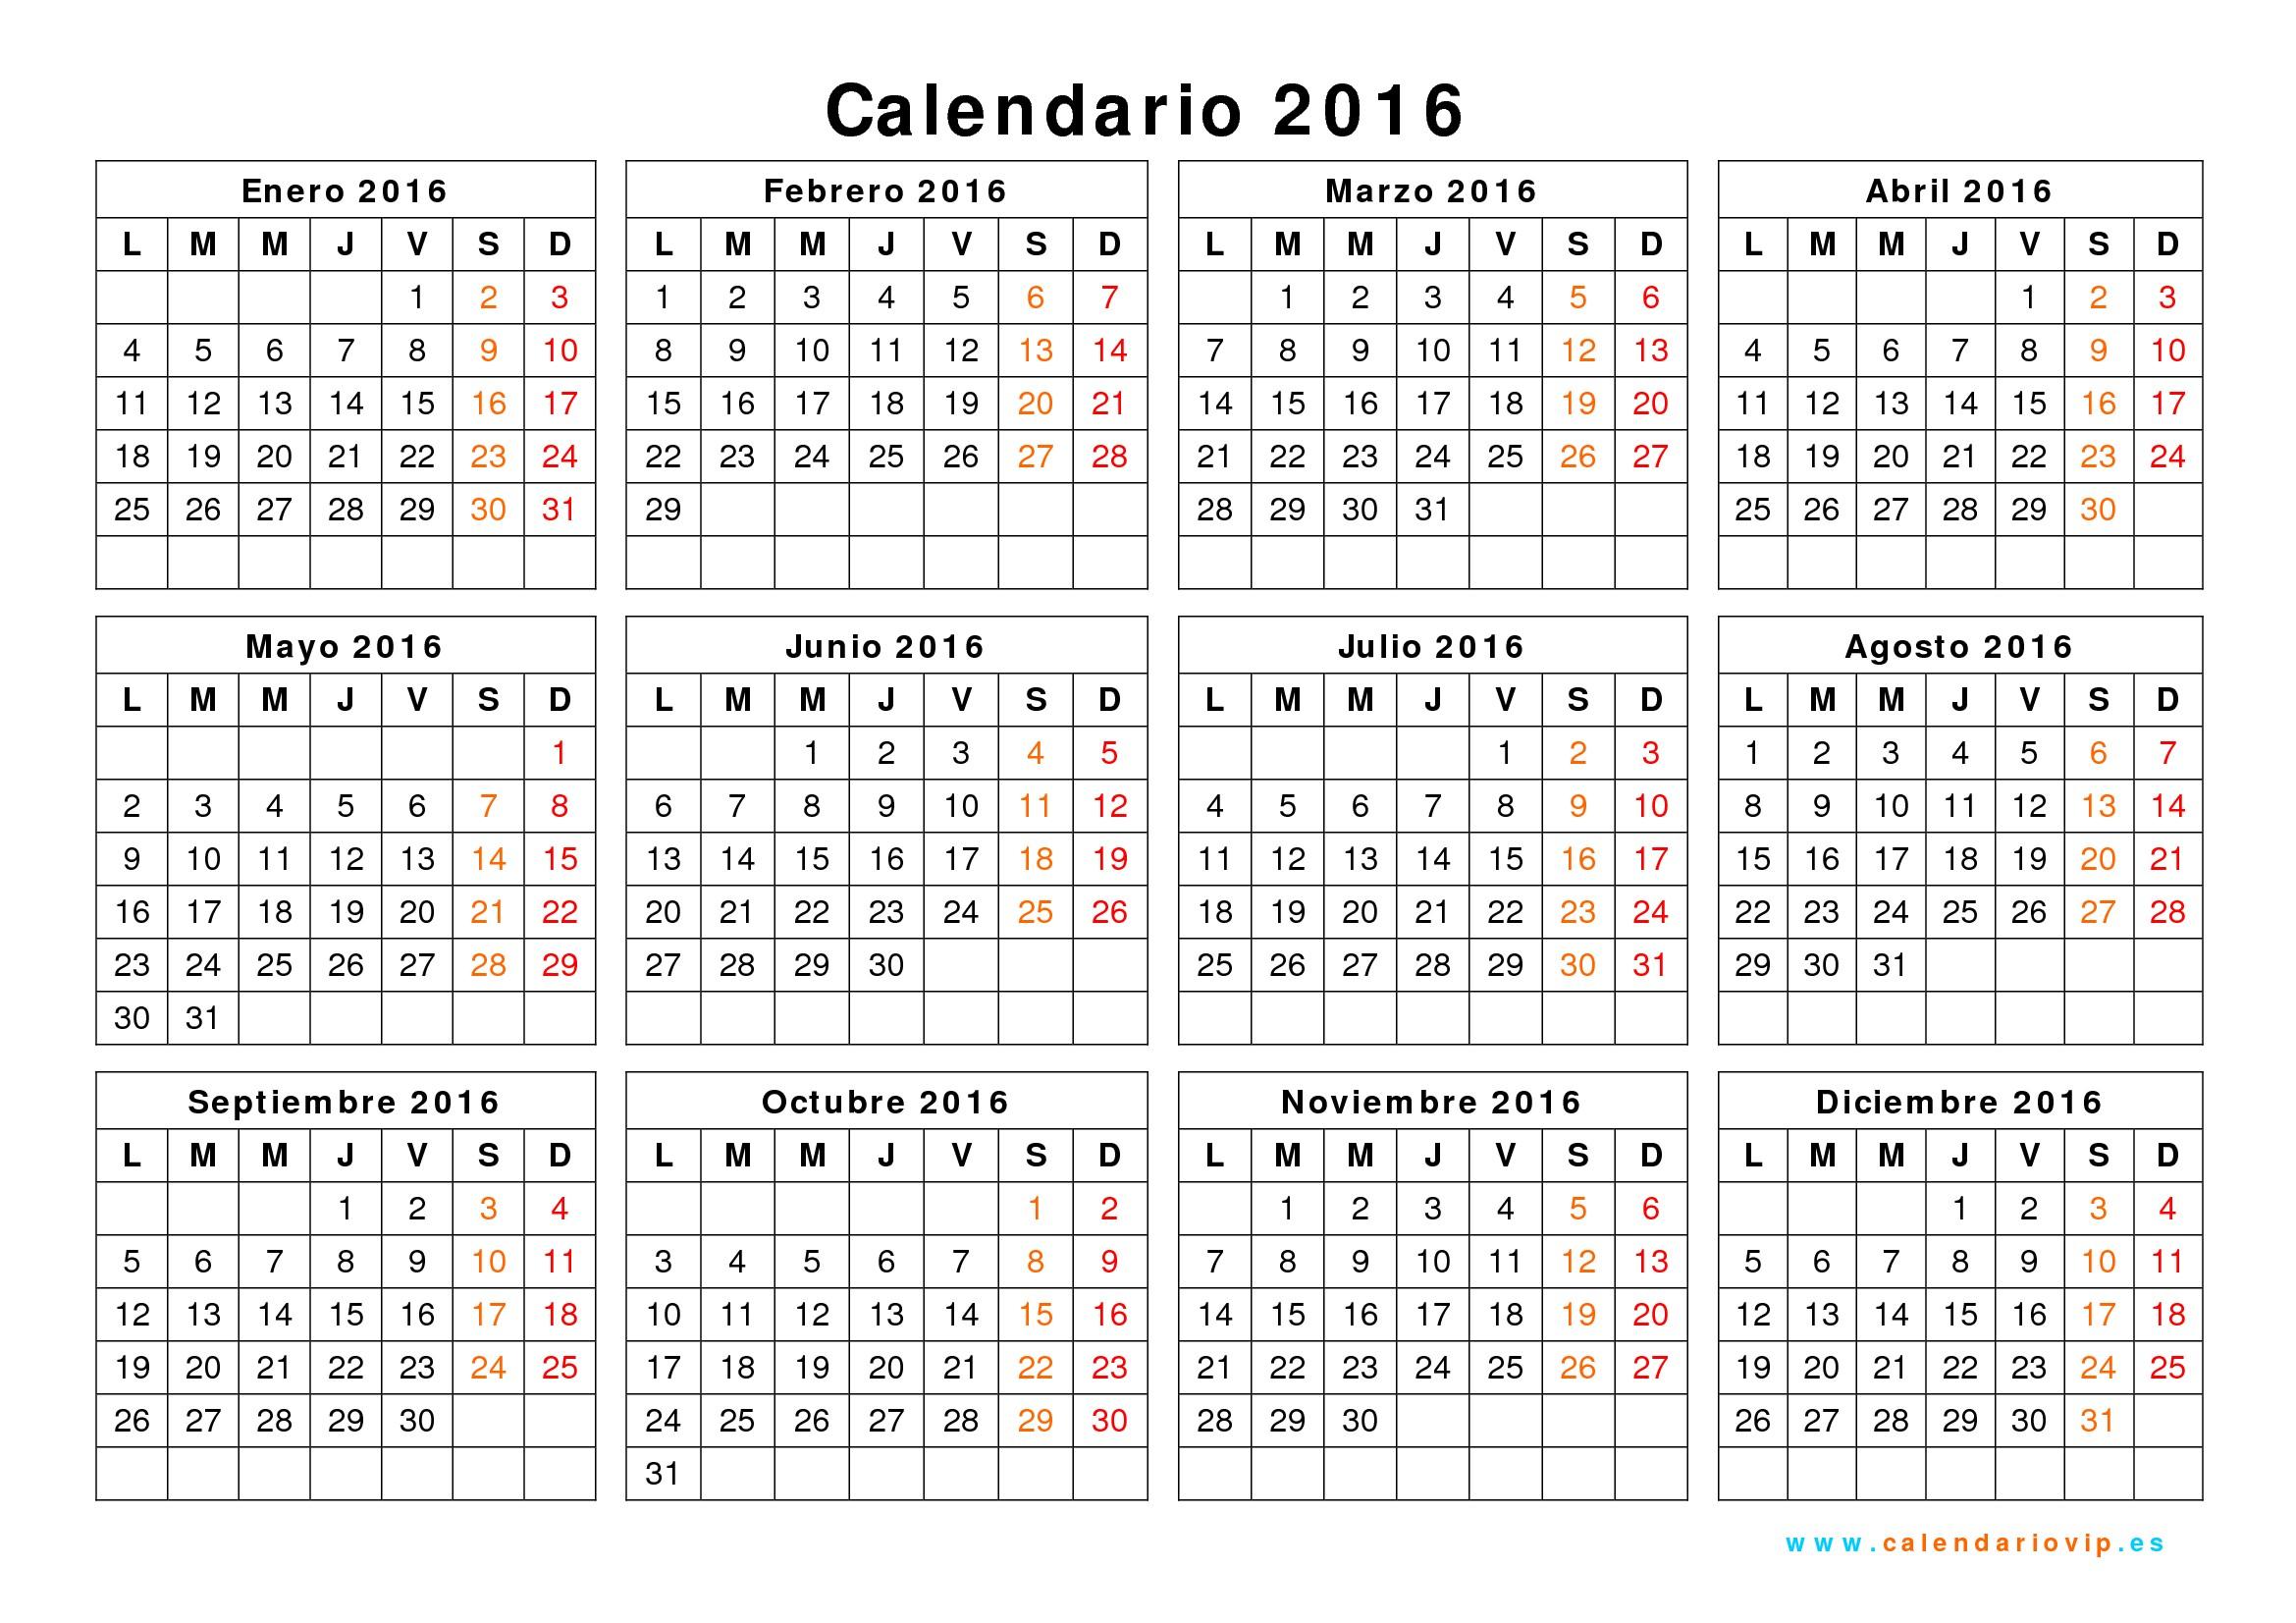 Calendario 2016 Excel calendario mensual 2015 excel calendario